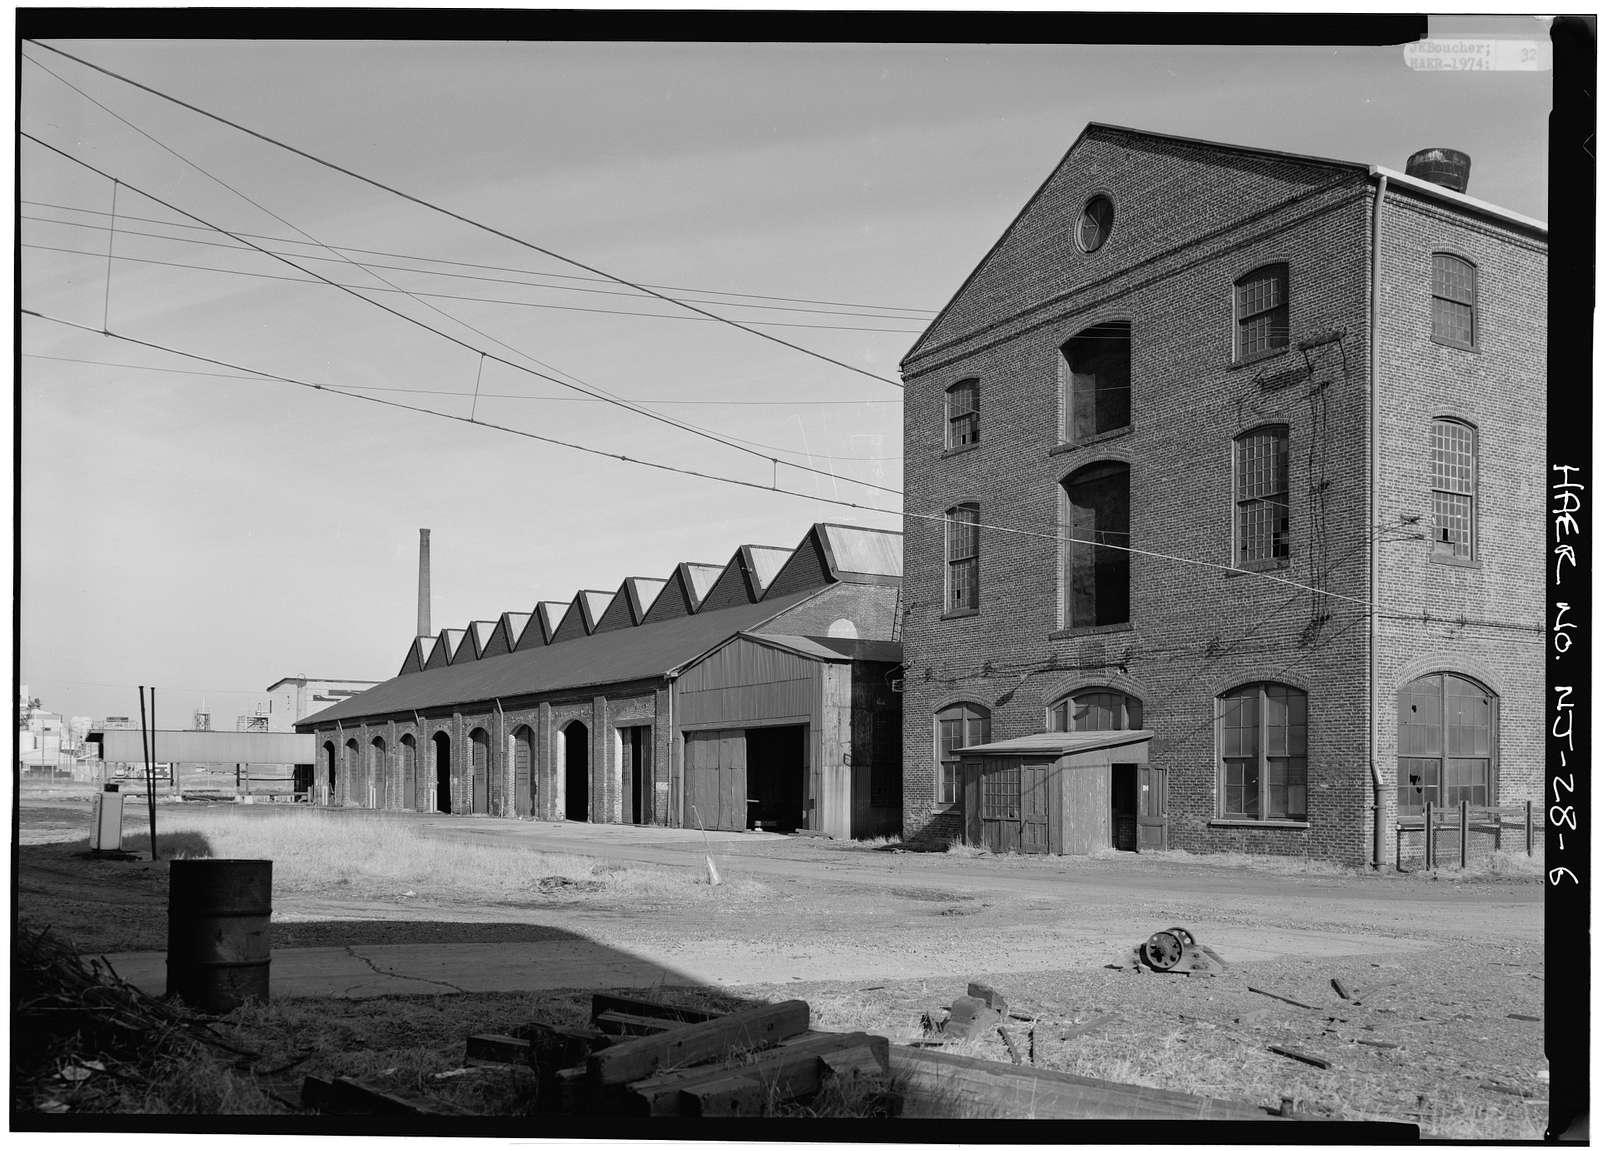 Ichabod T. Williams & Sons Sawmill & Veneer Plant, Roosevelt Avenue at Carteret Avenue, Carteret, Middlesex County, NJ